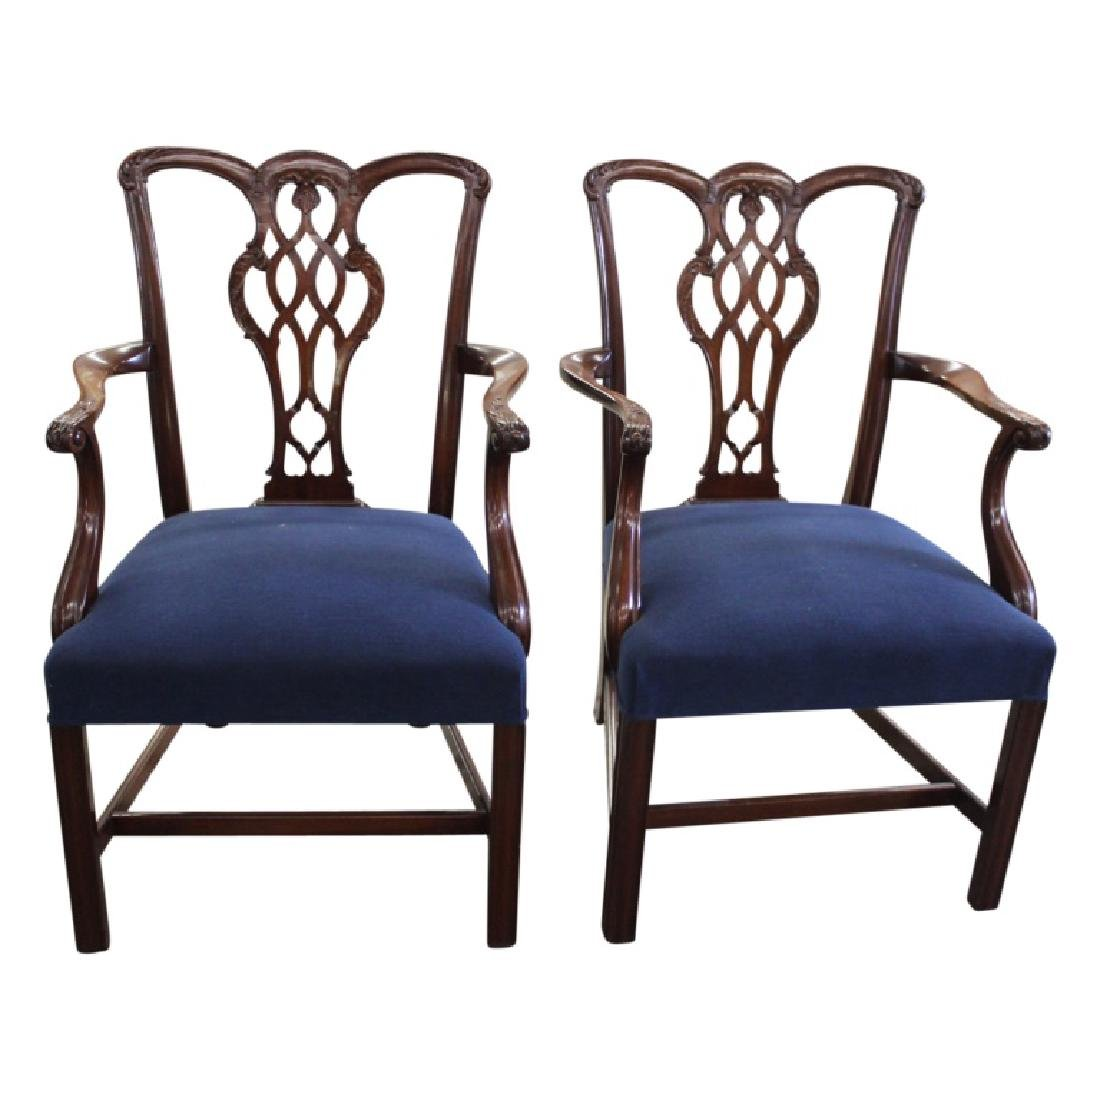 Schmieg & Kotztan Dining Chairs - 8 PCS - 4